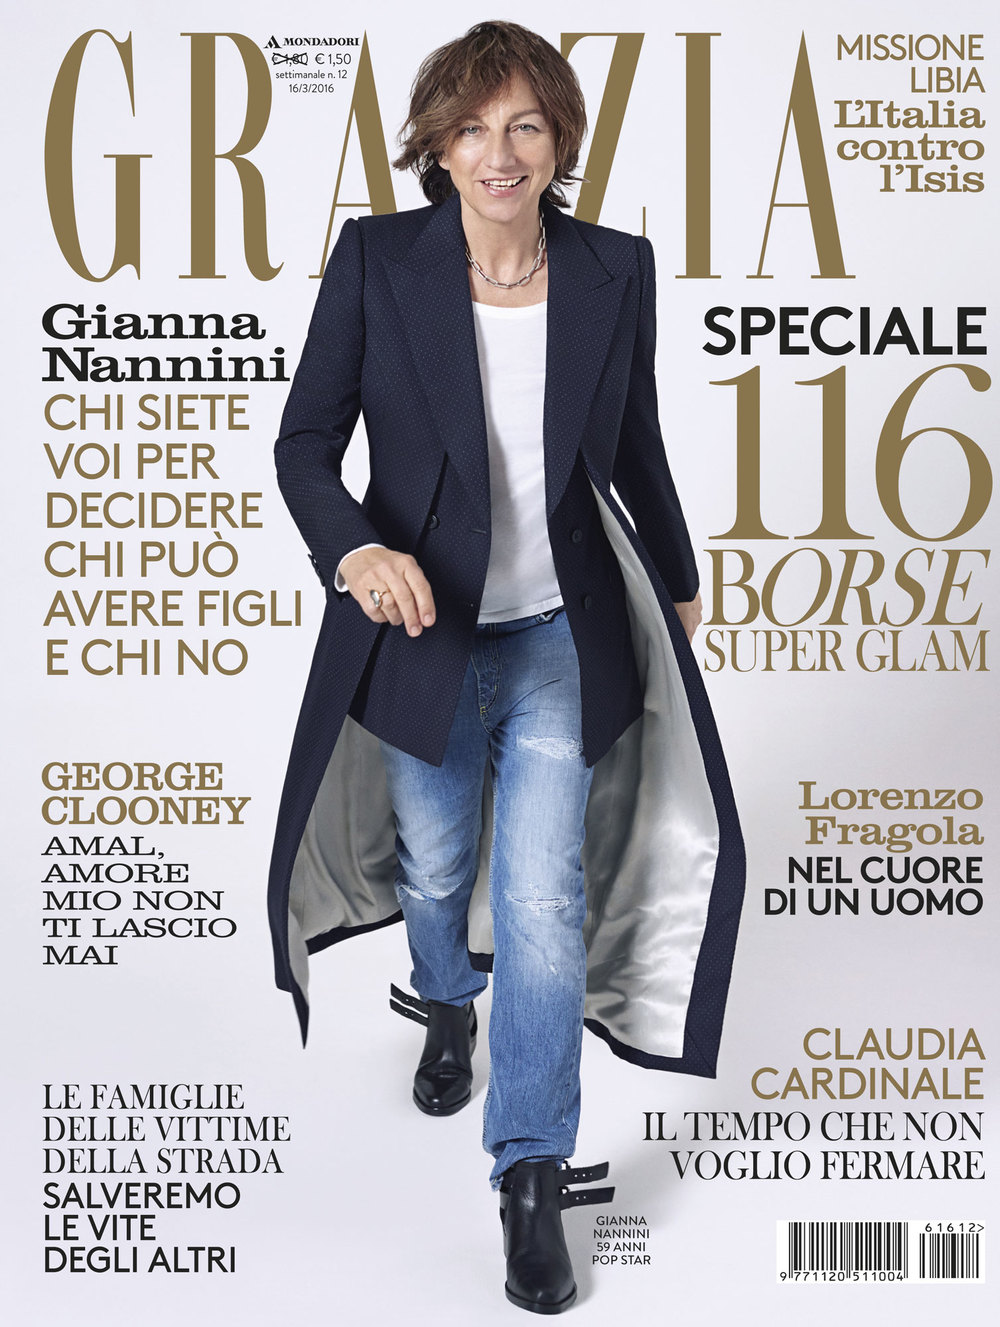 GR12_COVER-edicola_1.jpg